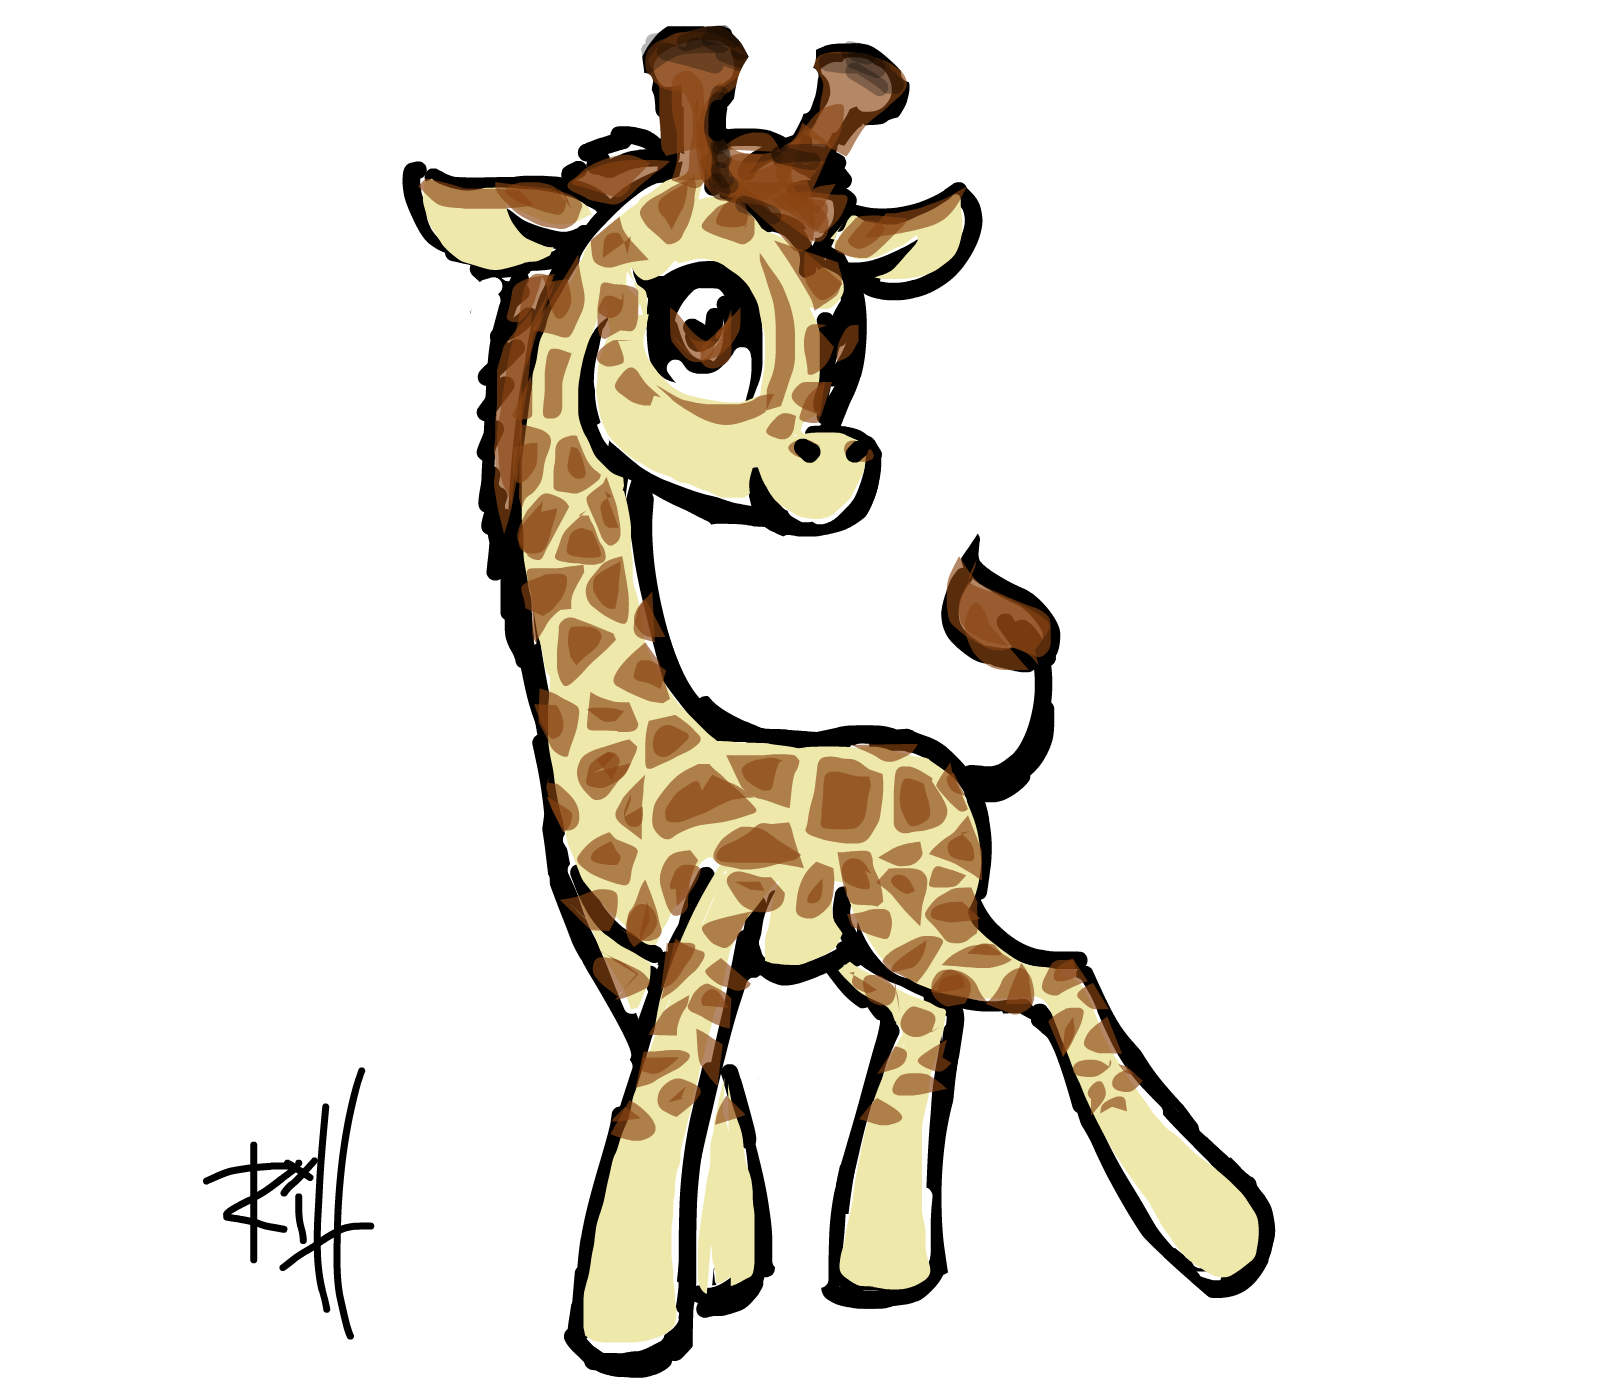 1600x1393 a brony giraffe drawings sketchport giraffe bee giraffe